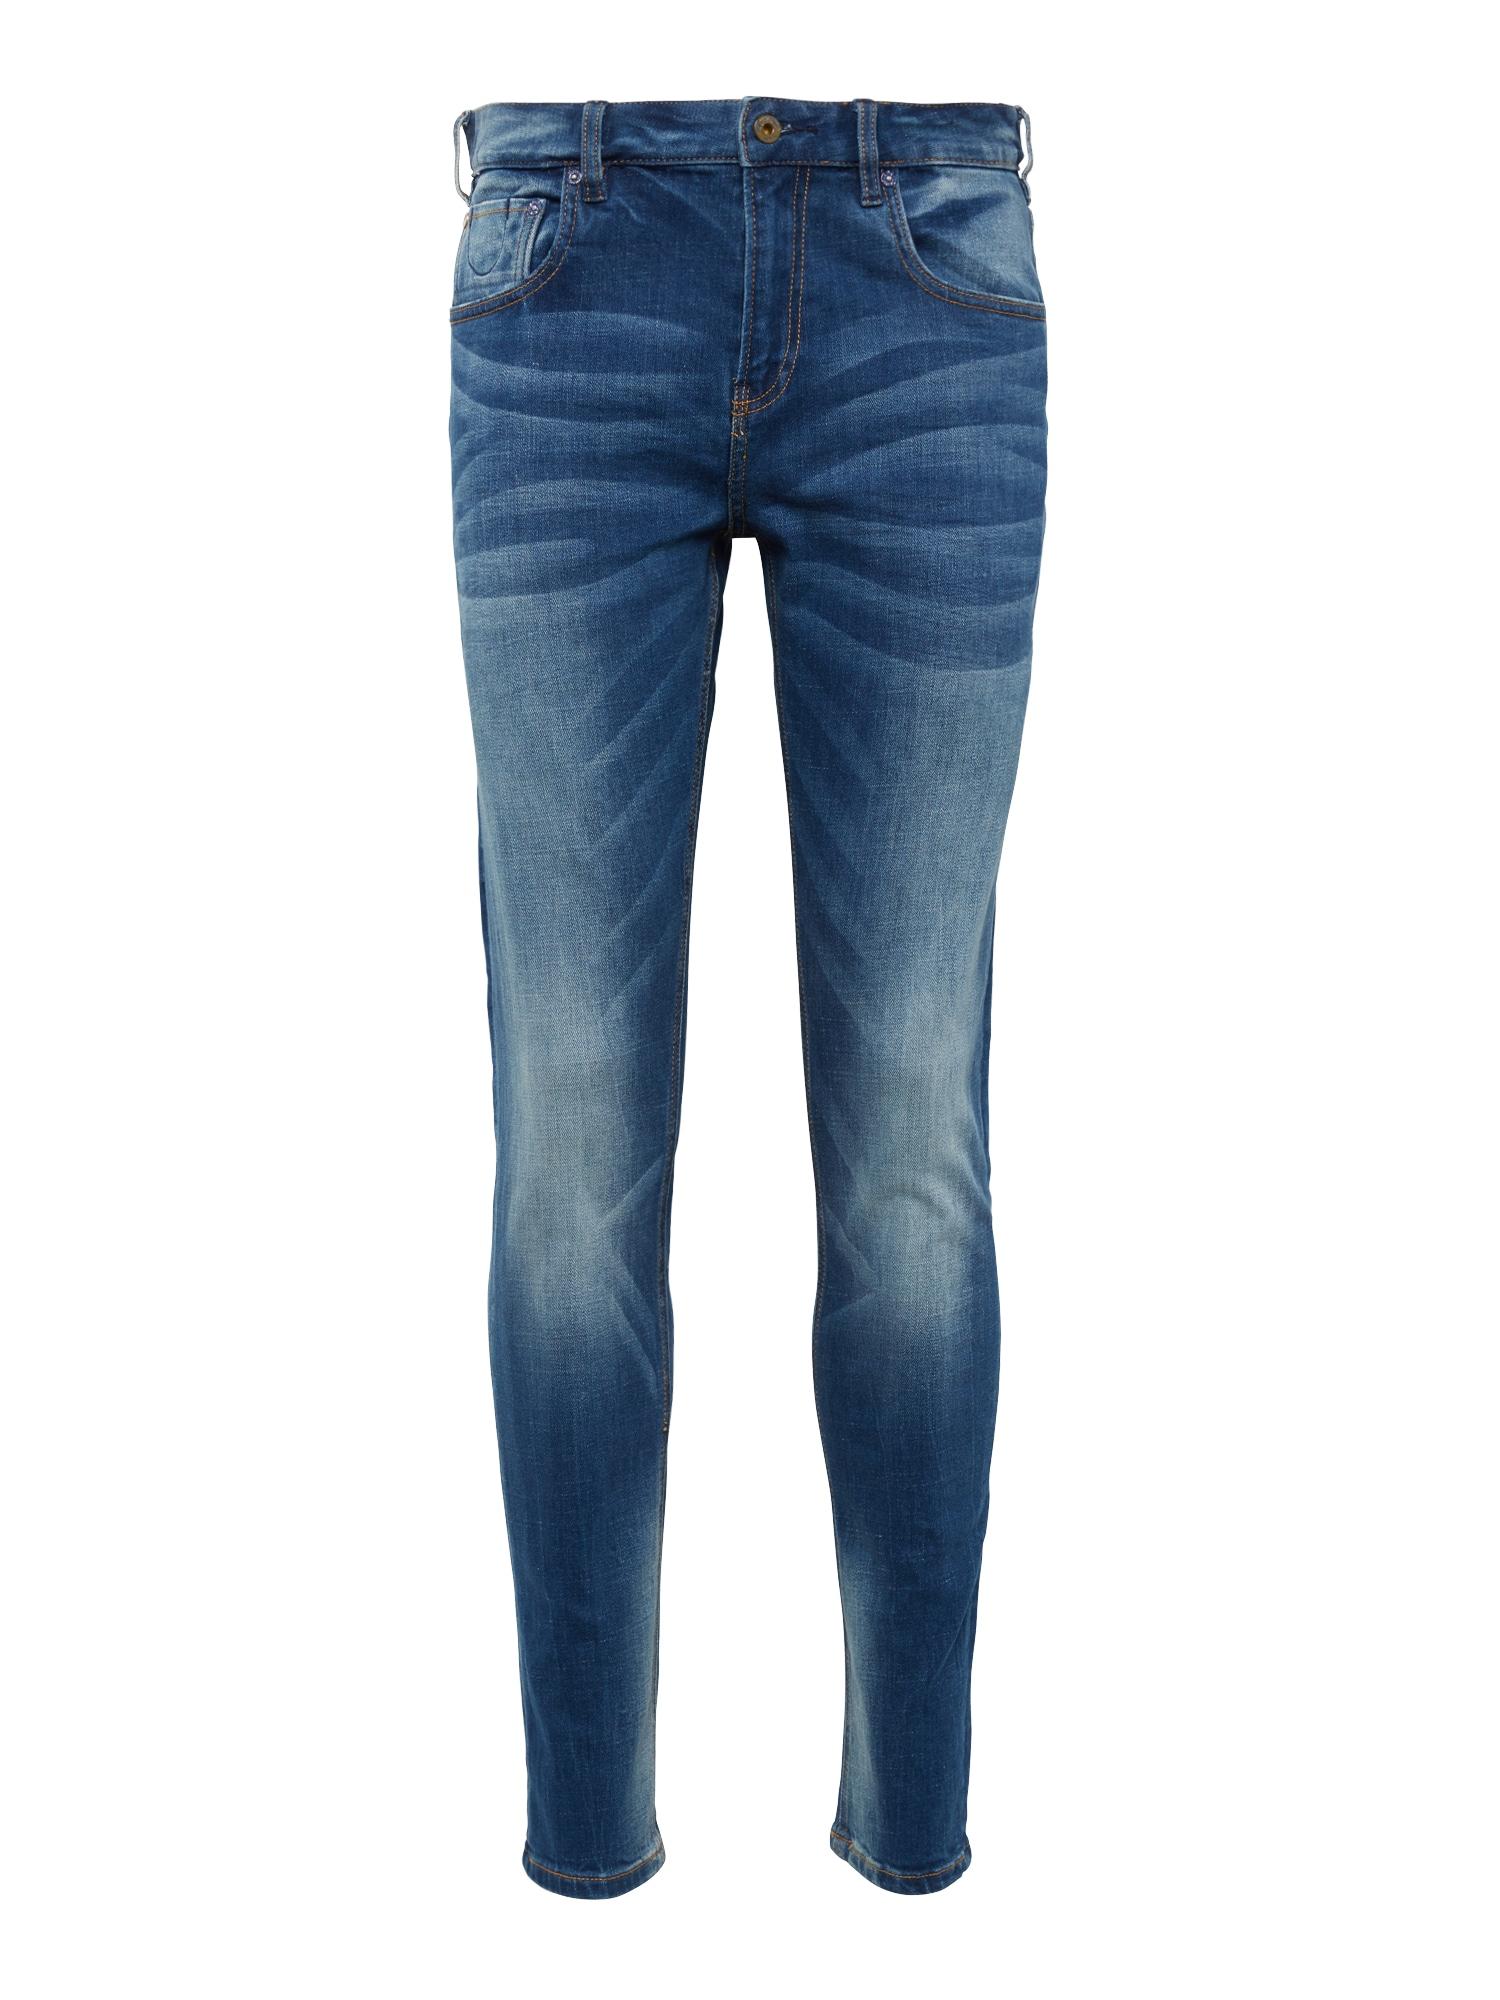 SCOTCH  and  SODA Heren Jeans Skim Kimono Yes blue denim